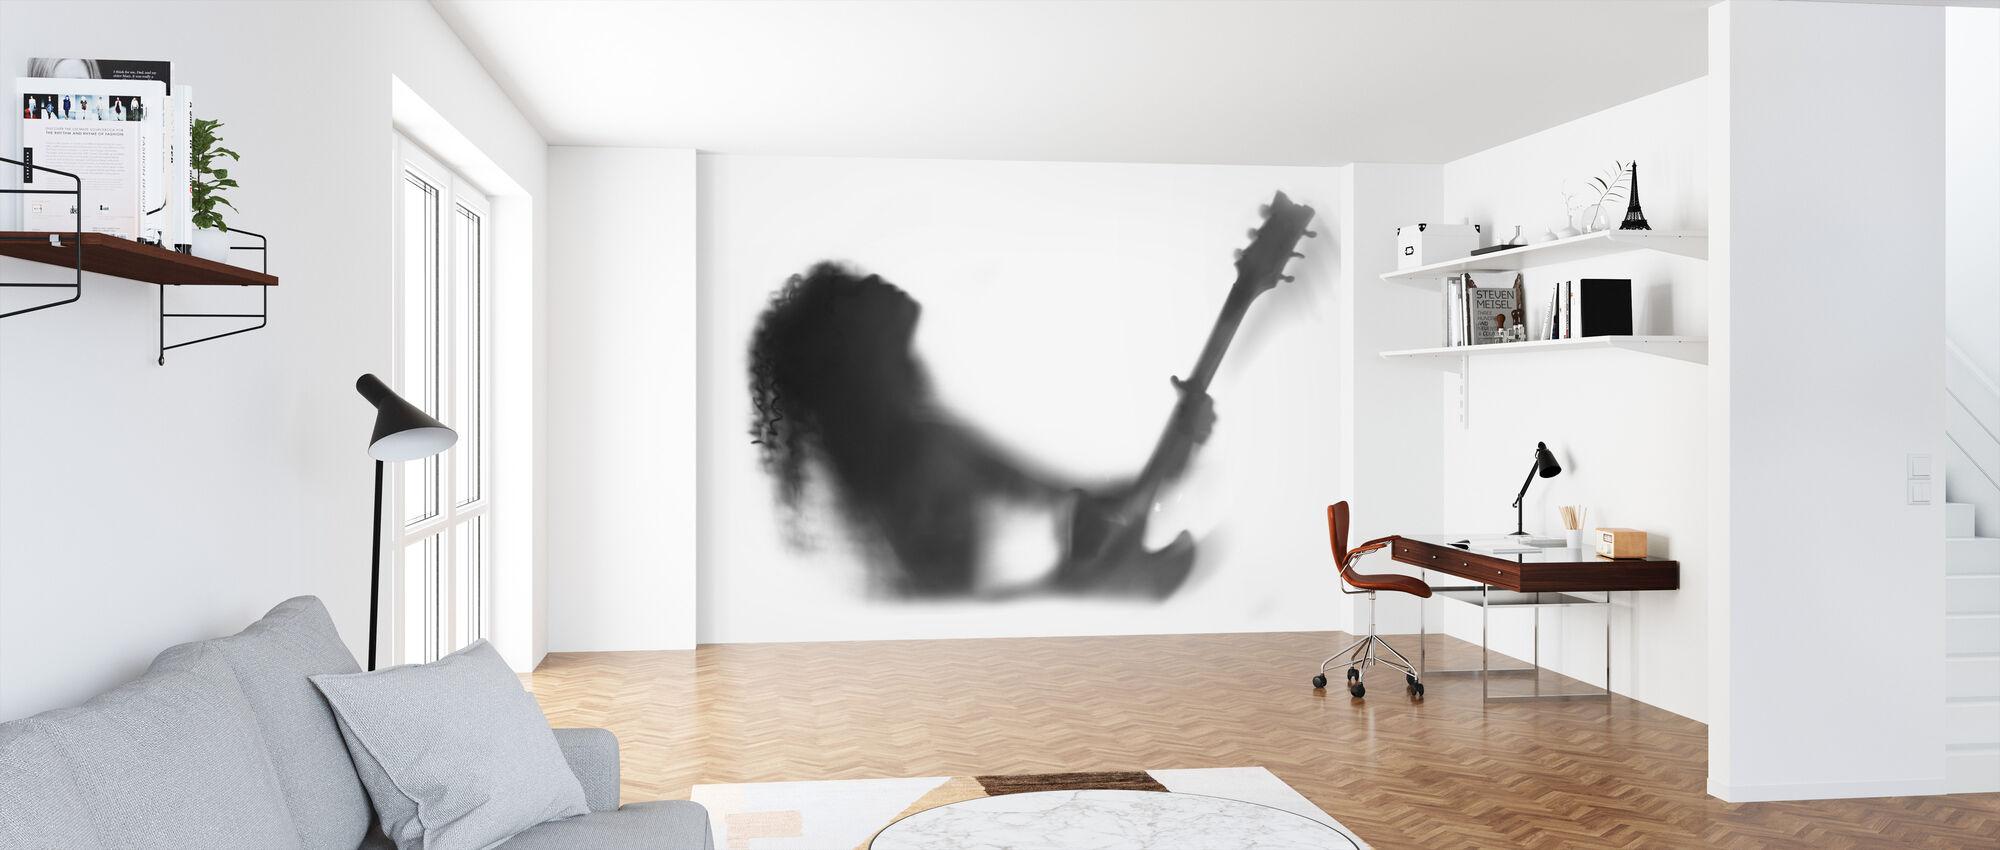 Guitar Solo - Wallpaper - Office